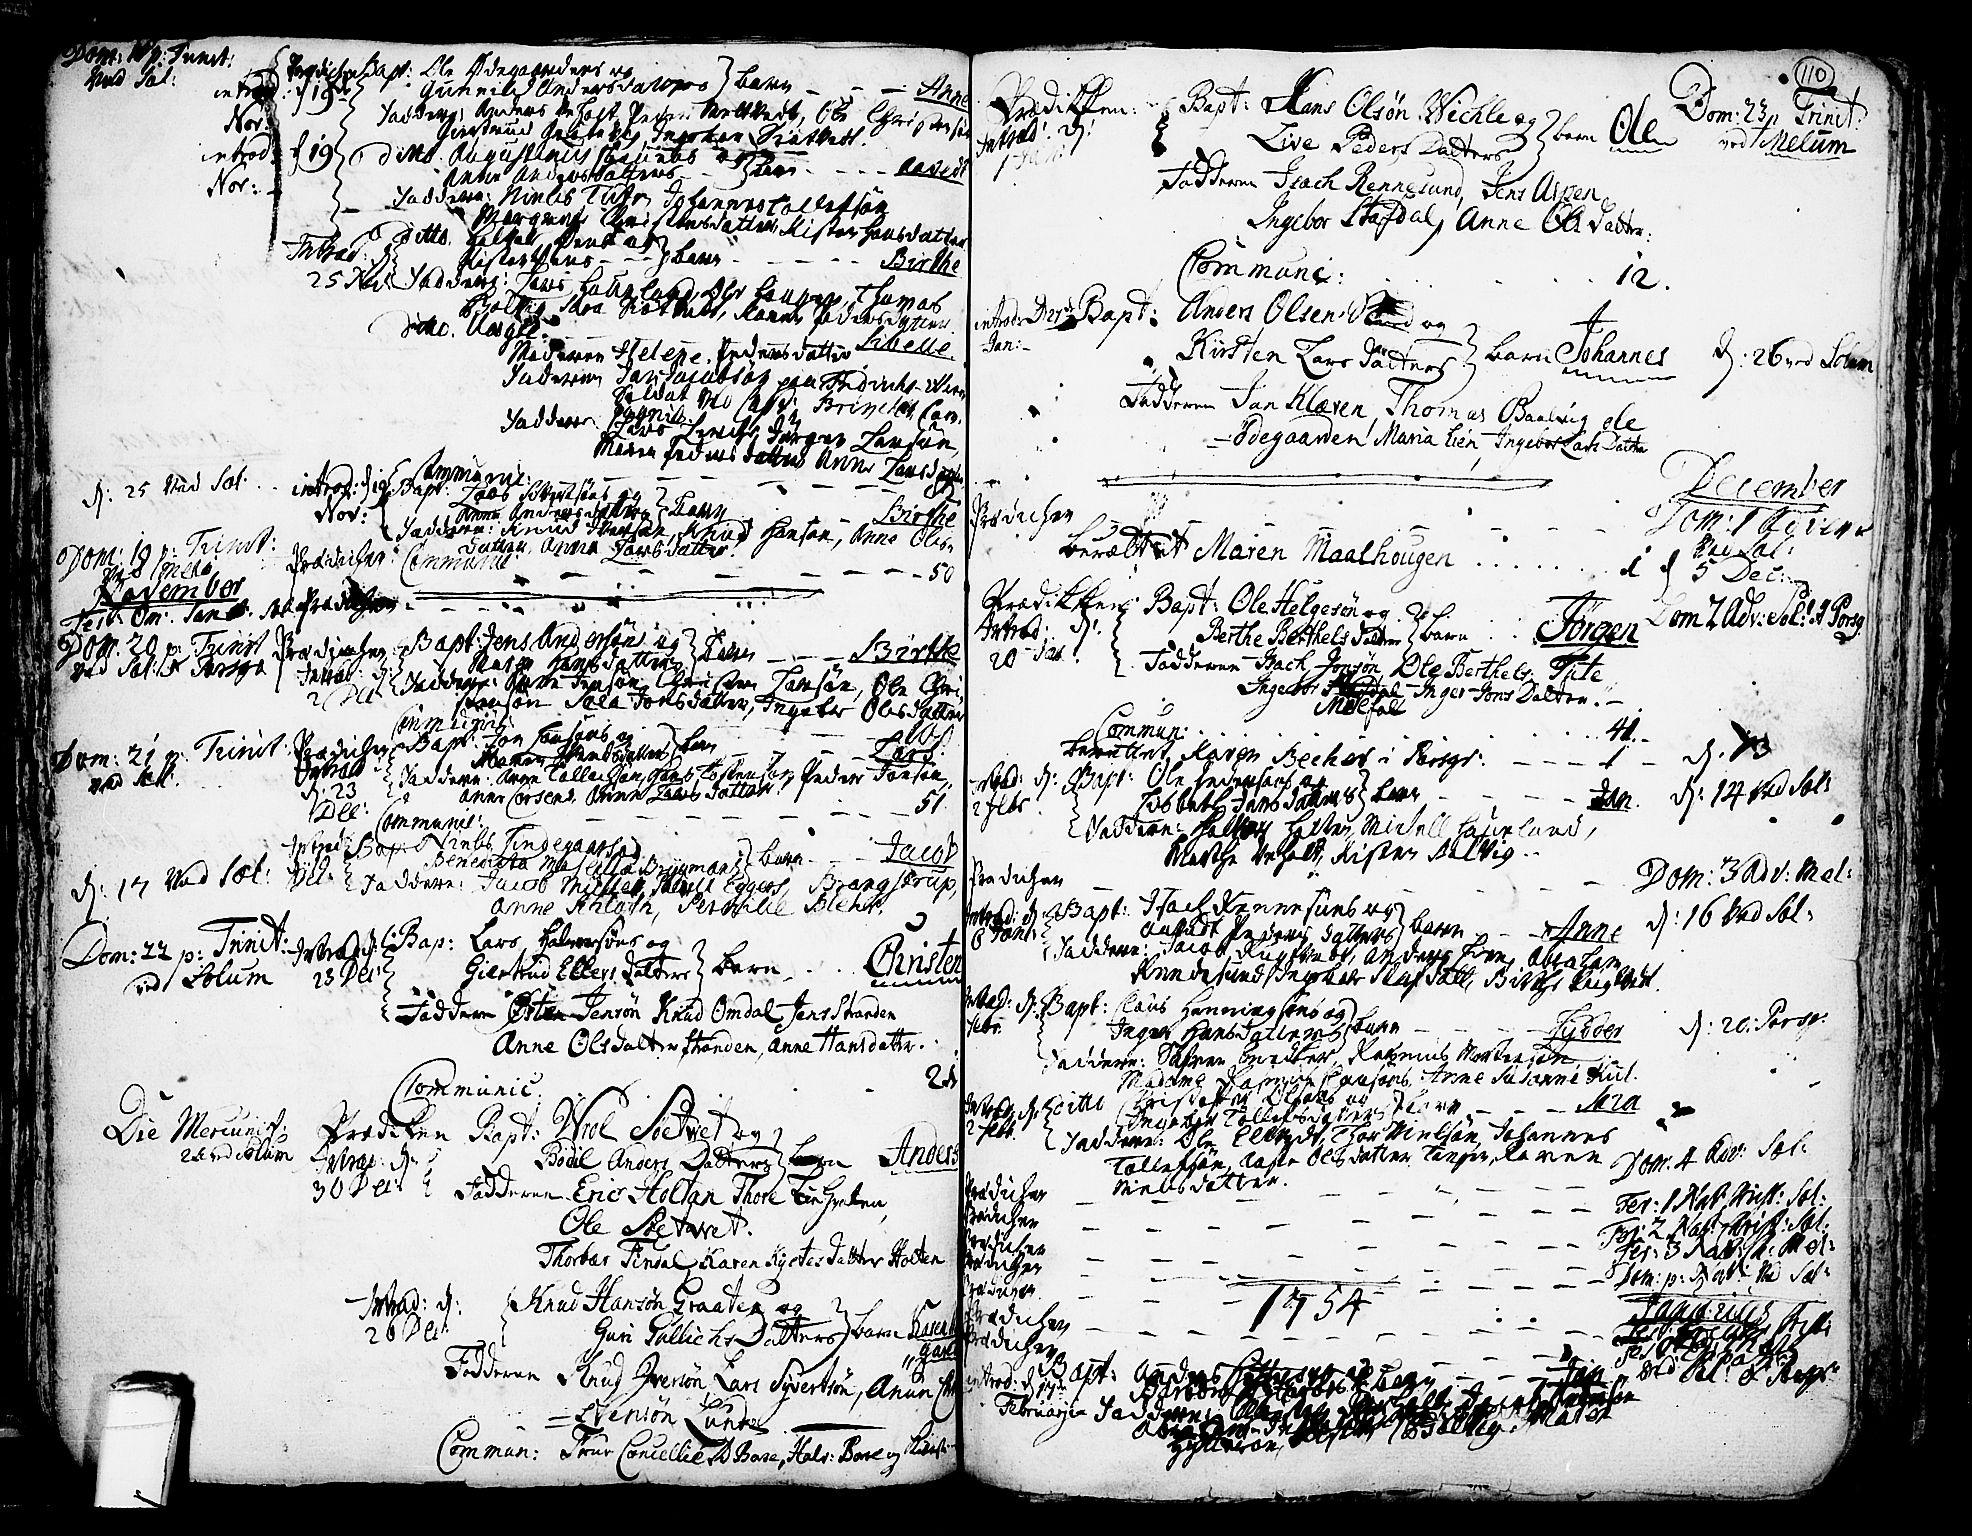 SAKO, Solum kirkebøker, F/Fa/L0002: Ministerialbok nr. I 2, 1713-1761, s. 110